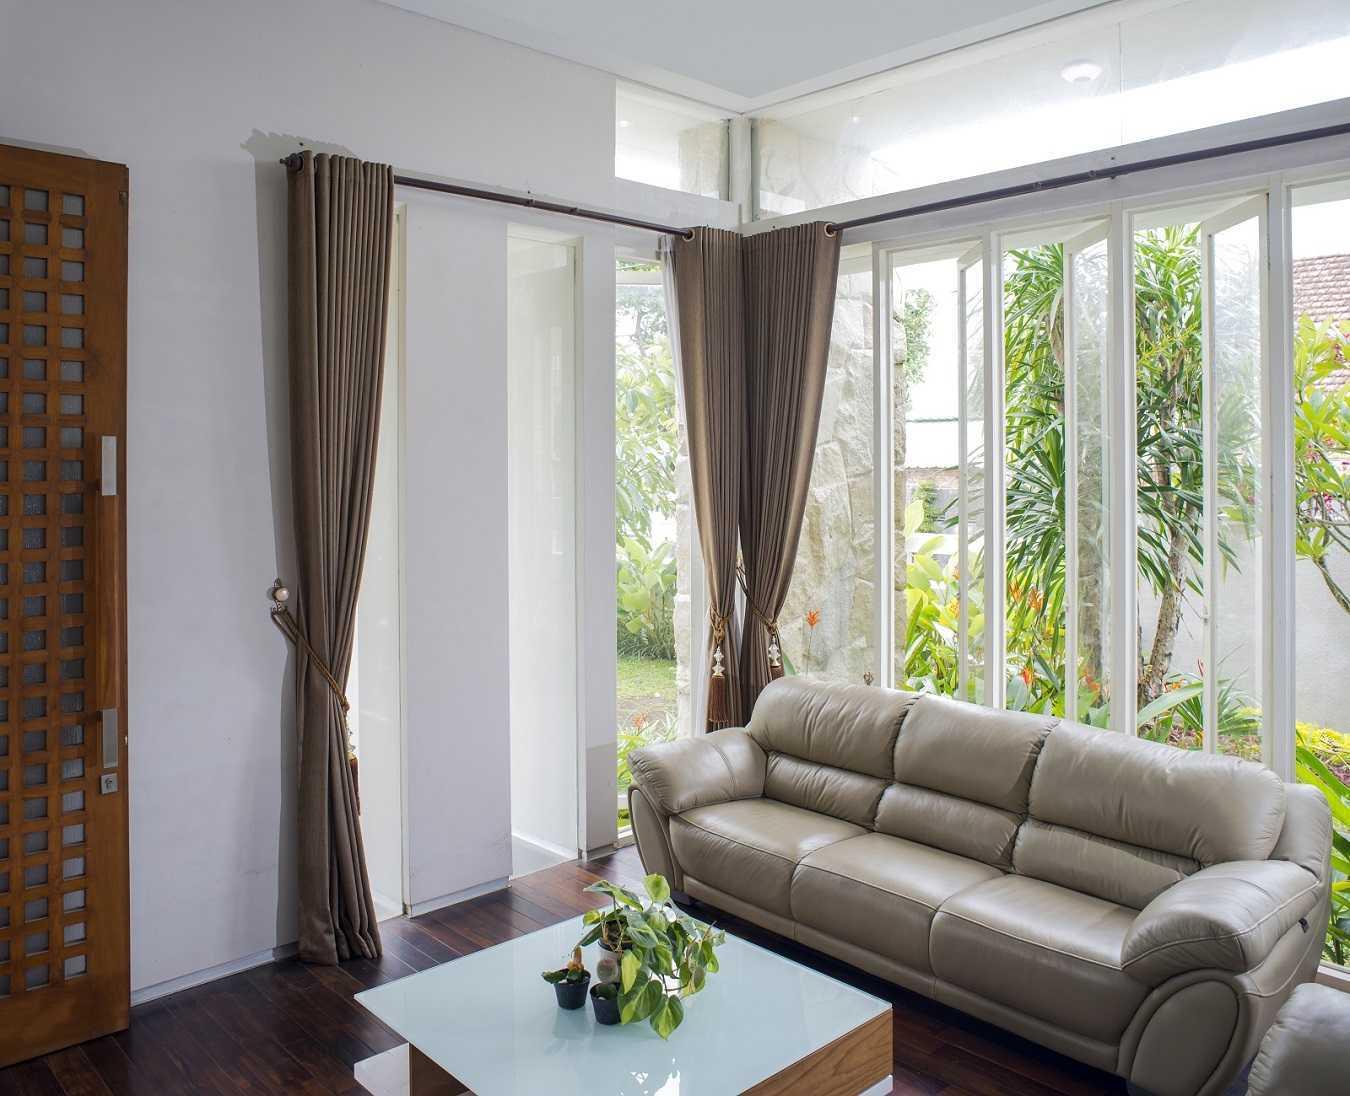 Satuvista Architect Rumah Tropis Hook Kabupaten Jombang, Jawa Timur, Indonesia Jawa Timur, Indonesia Living Room   48722